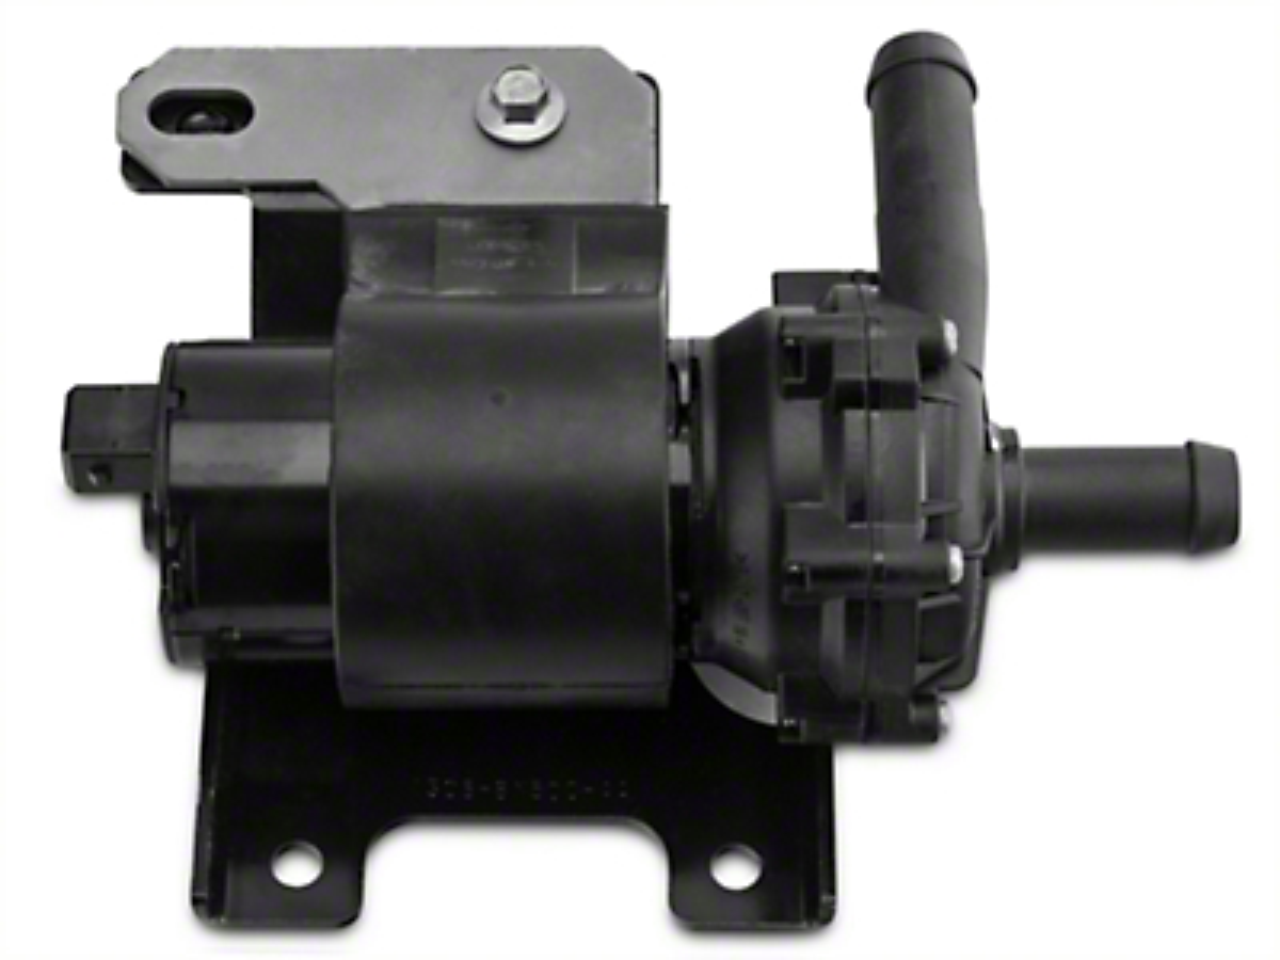 Roush Intercooler Pump w/ Bracket (04-08 5.4L)